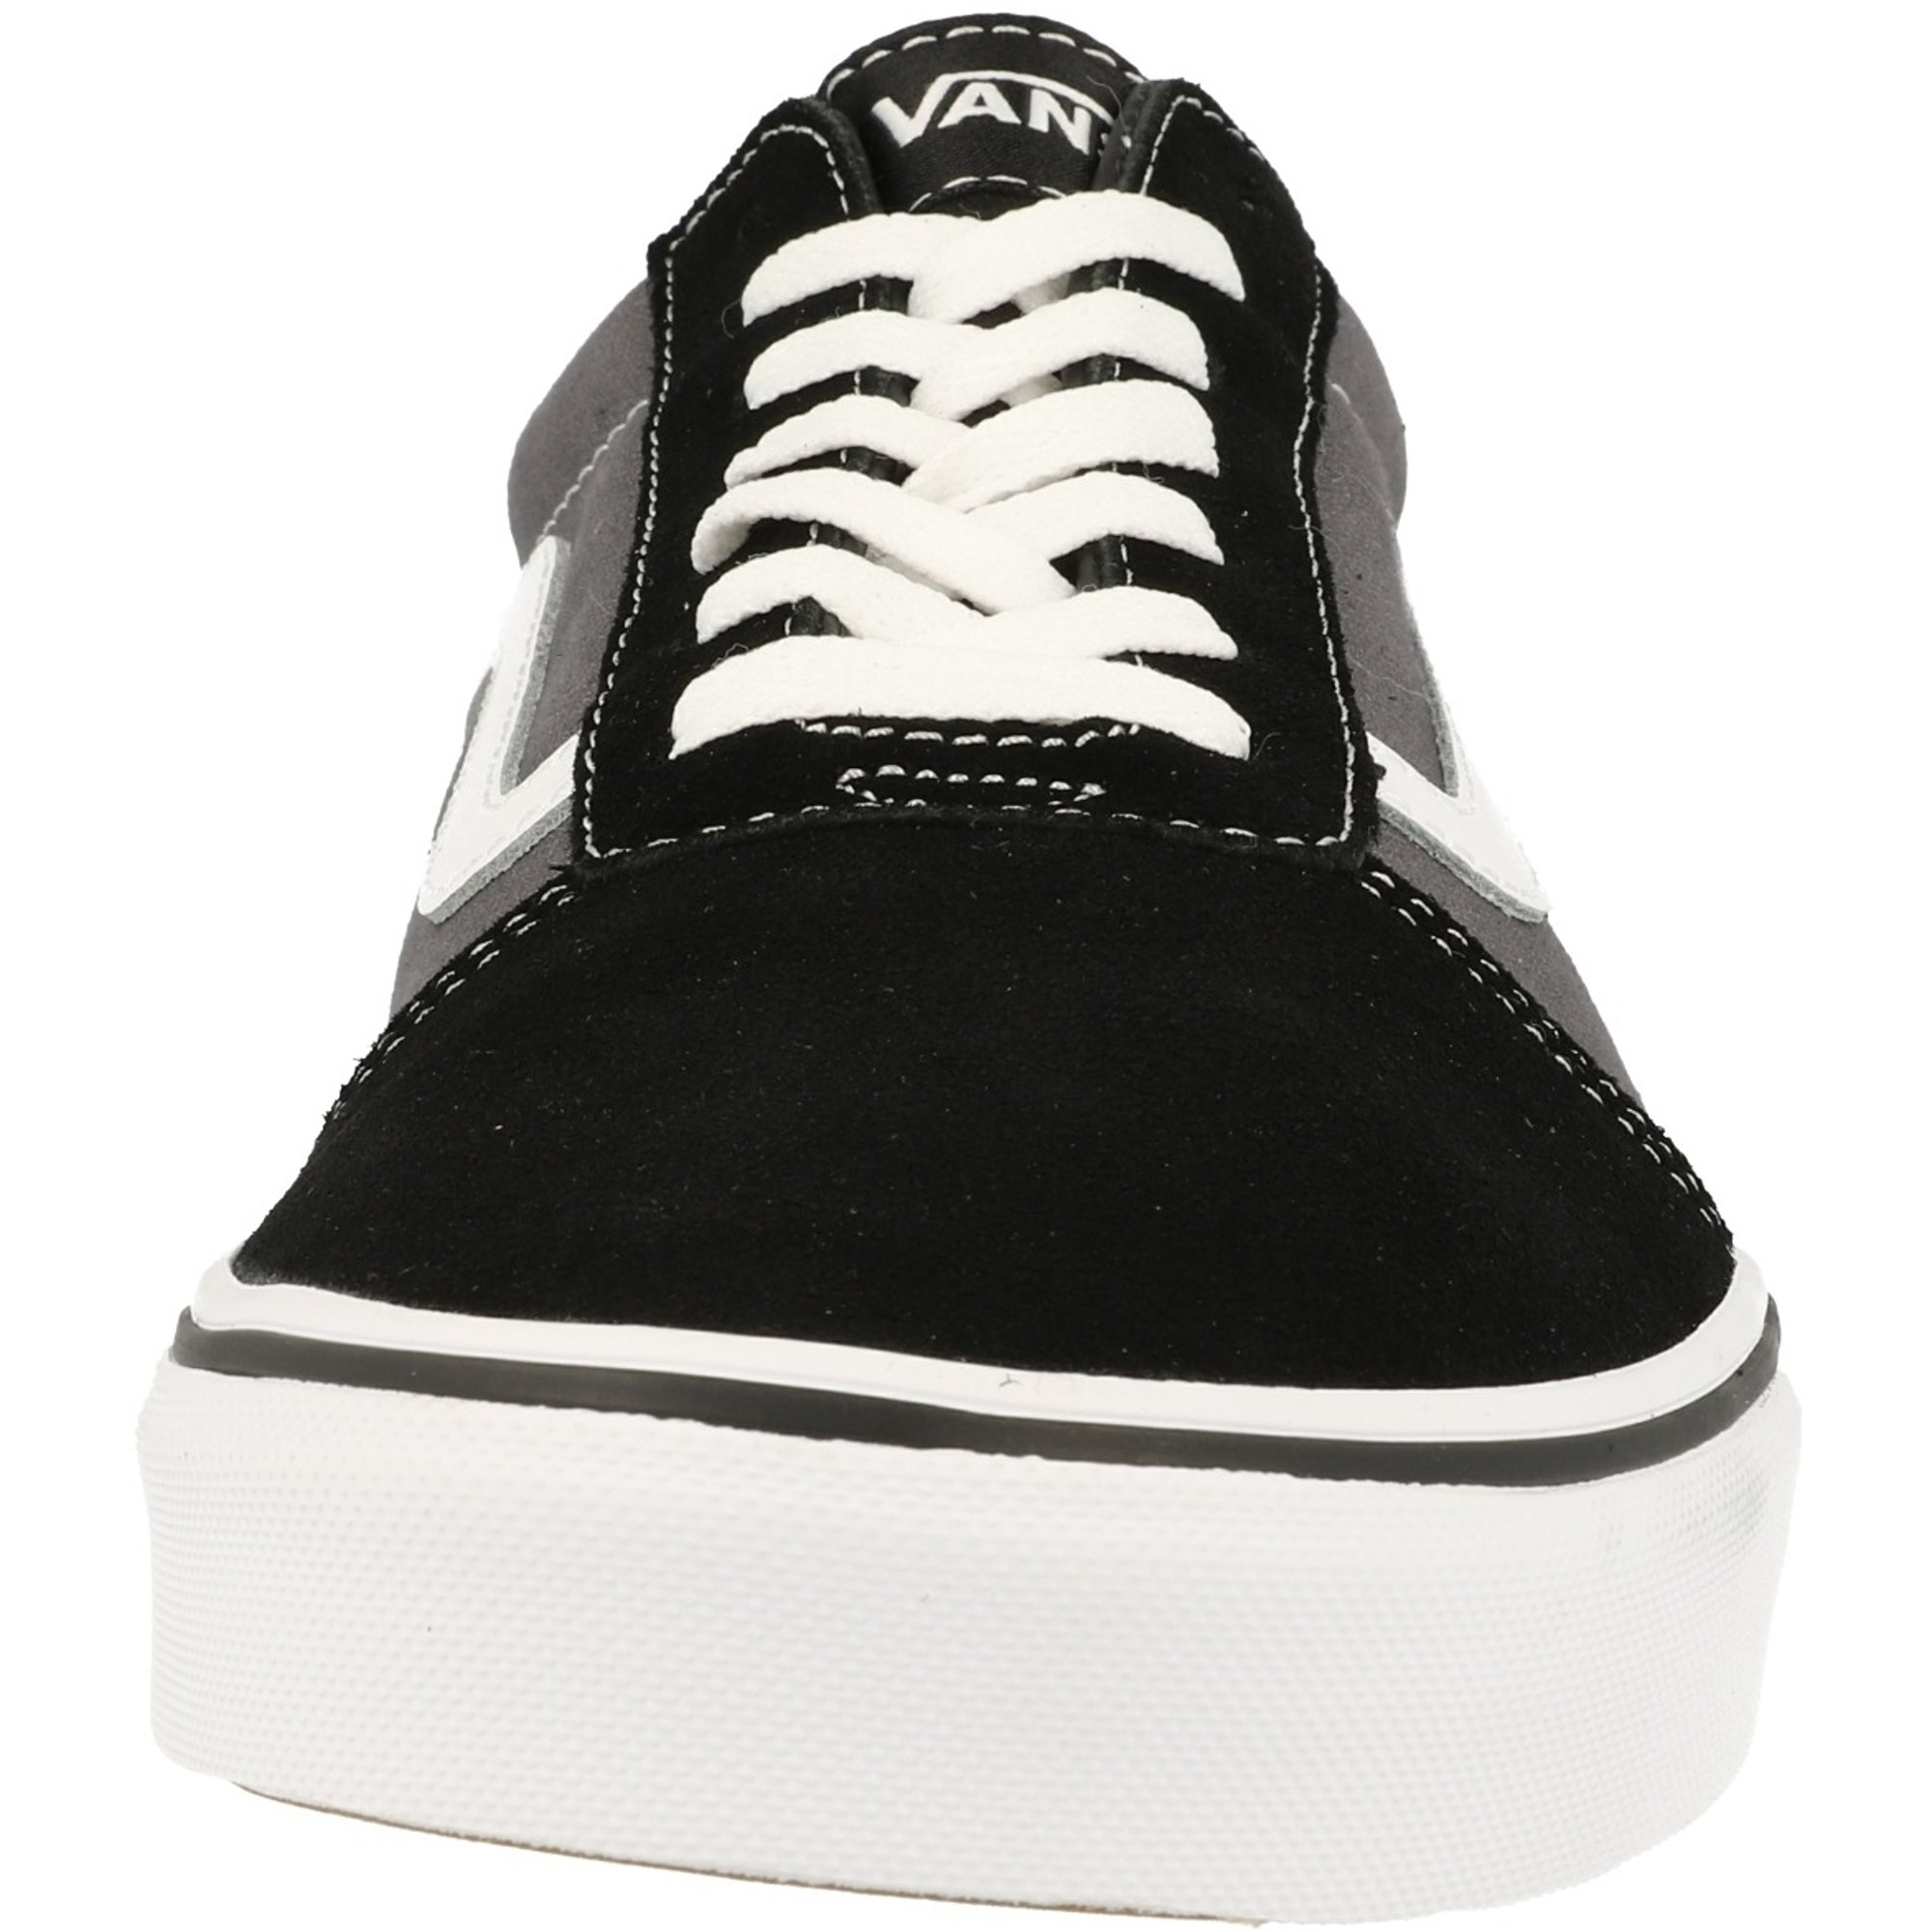 Vans Active MN Ward Black/Pewter Suede